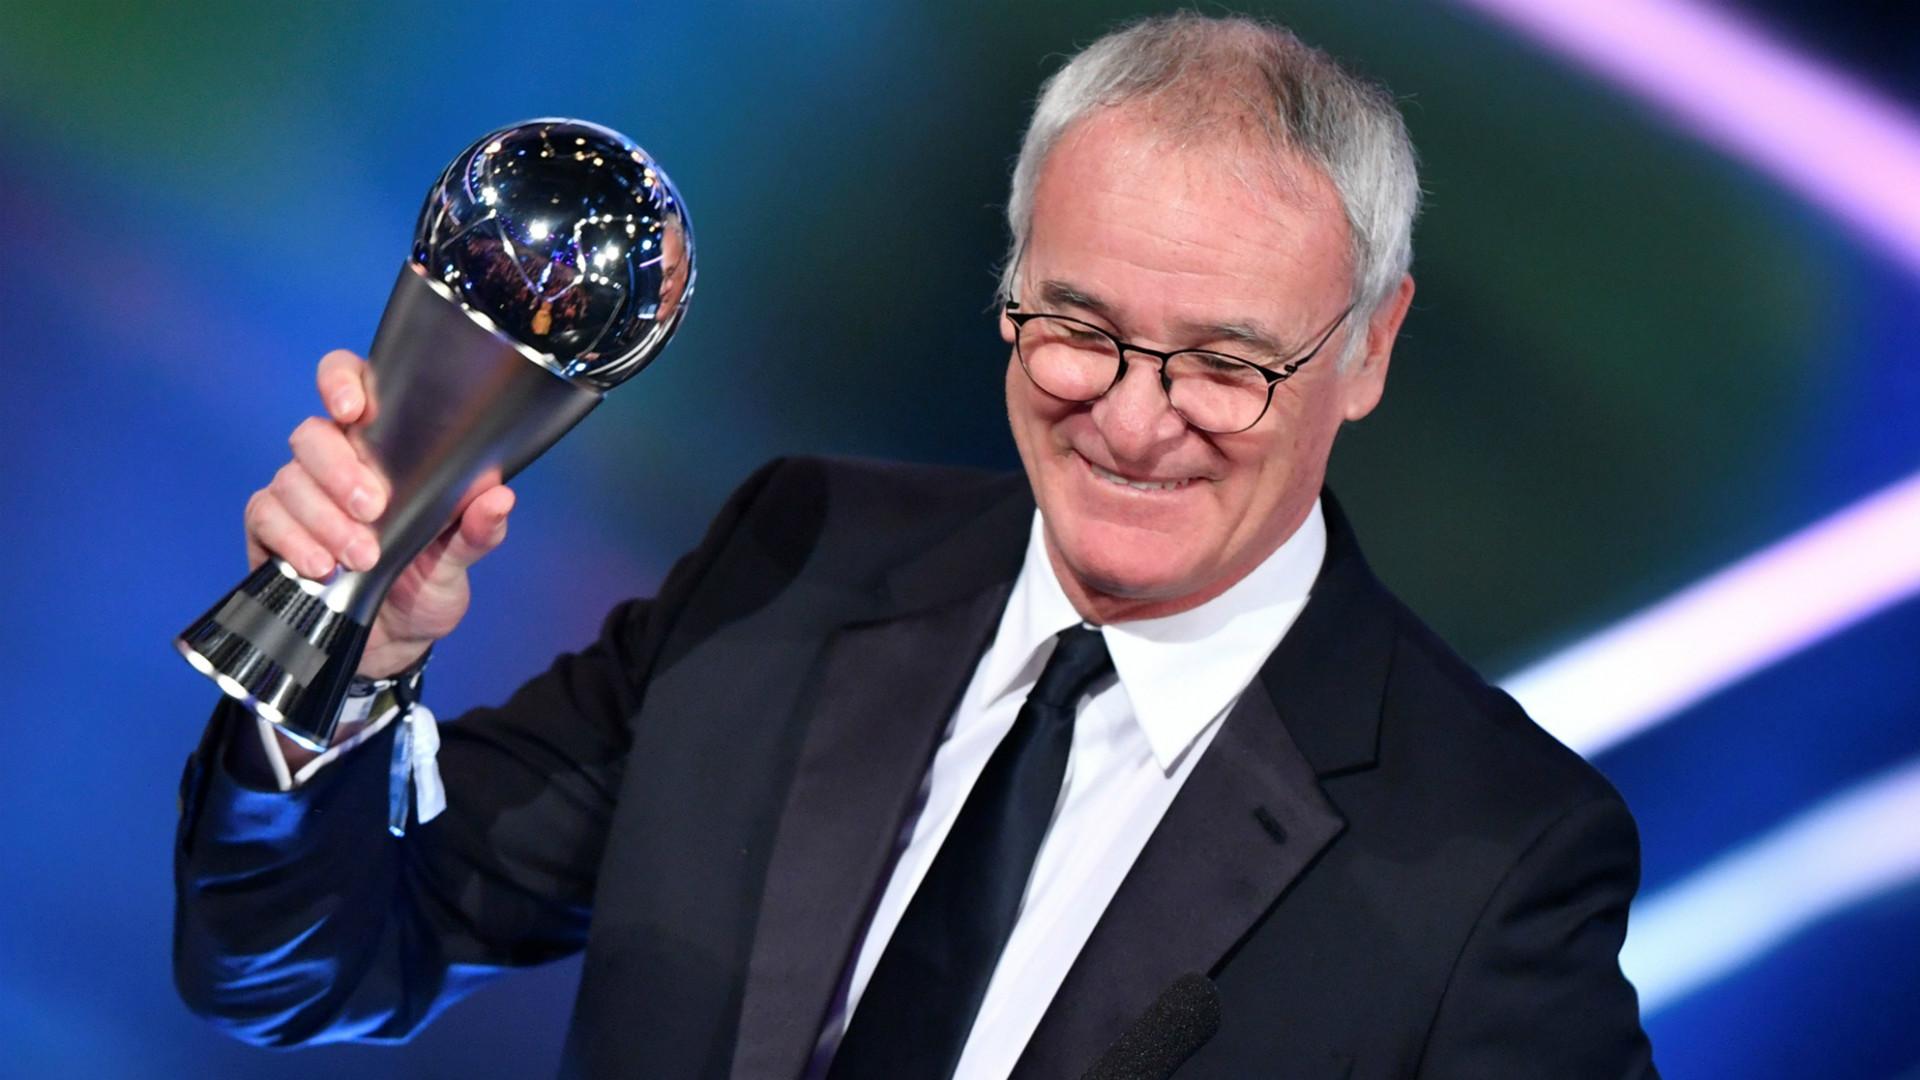 Claudio Ranieri FIFA Awards